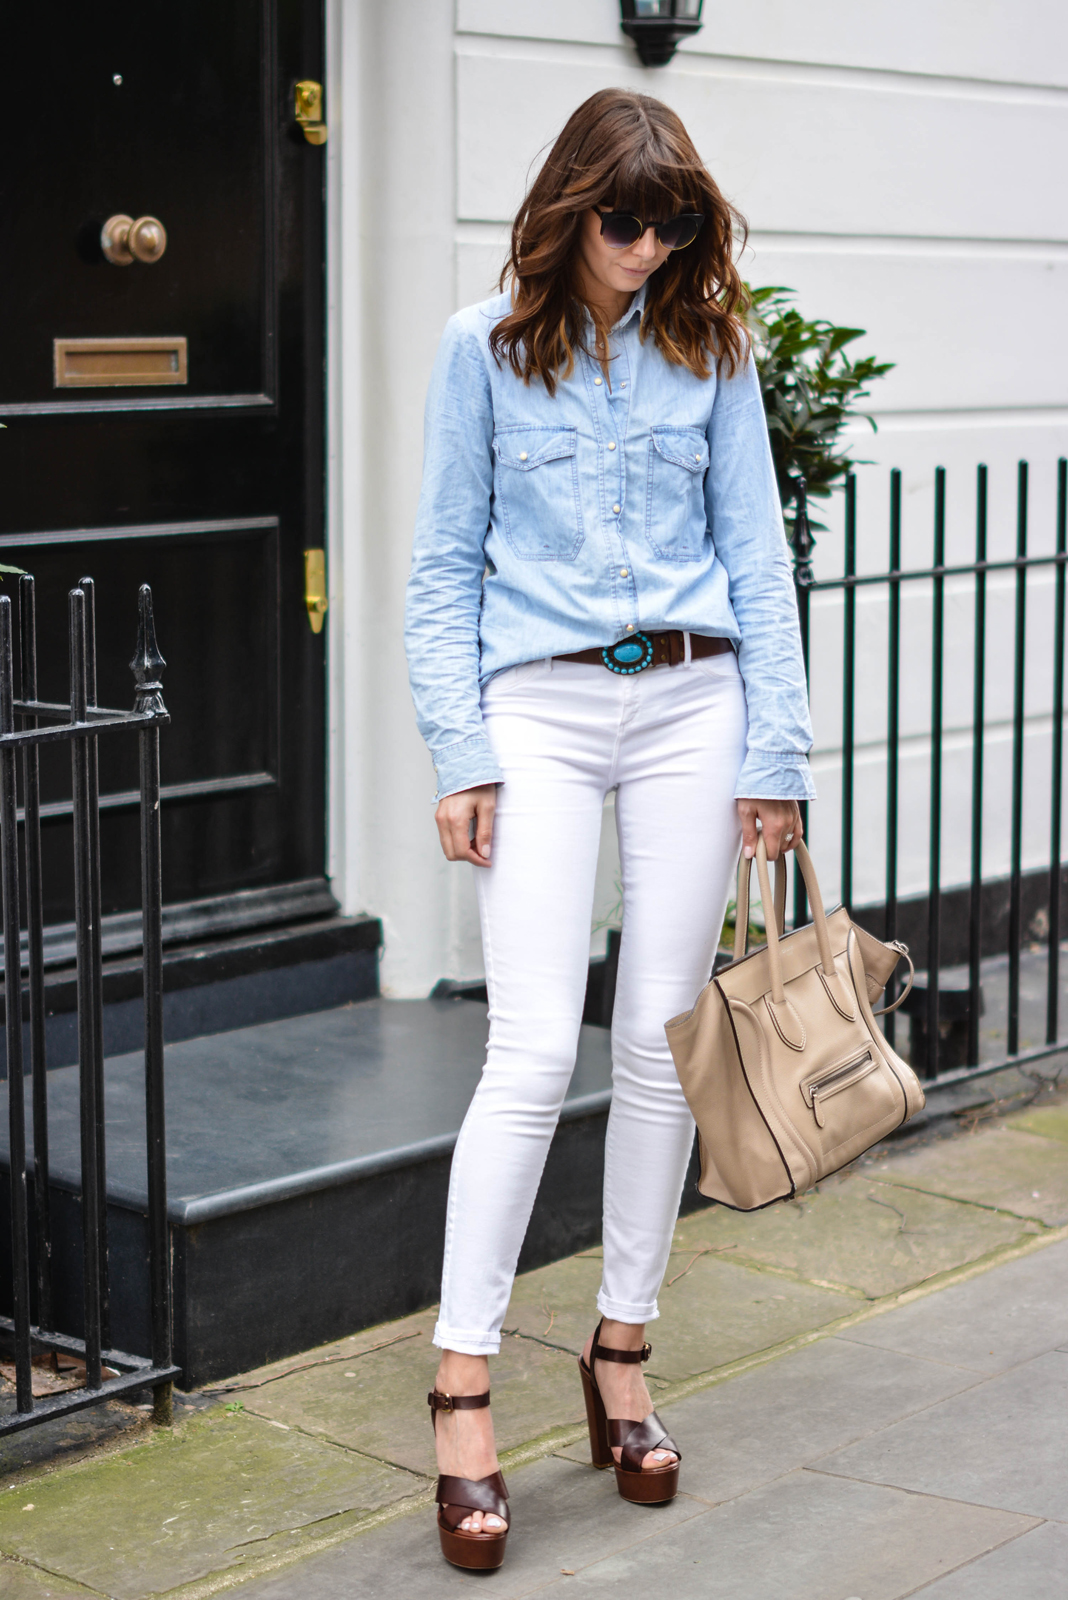 EJSTYLE - Emma Hill, River Island white skinny jeans, Topshop denim shirt, Turquoise brown leather belt, Celine mini luggage nude, Sante shoes brown platform sandals